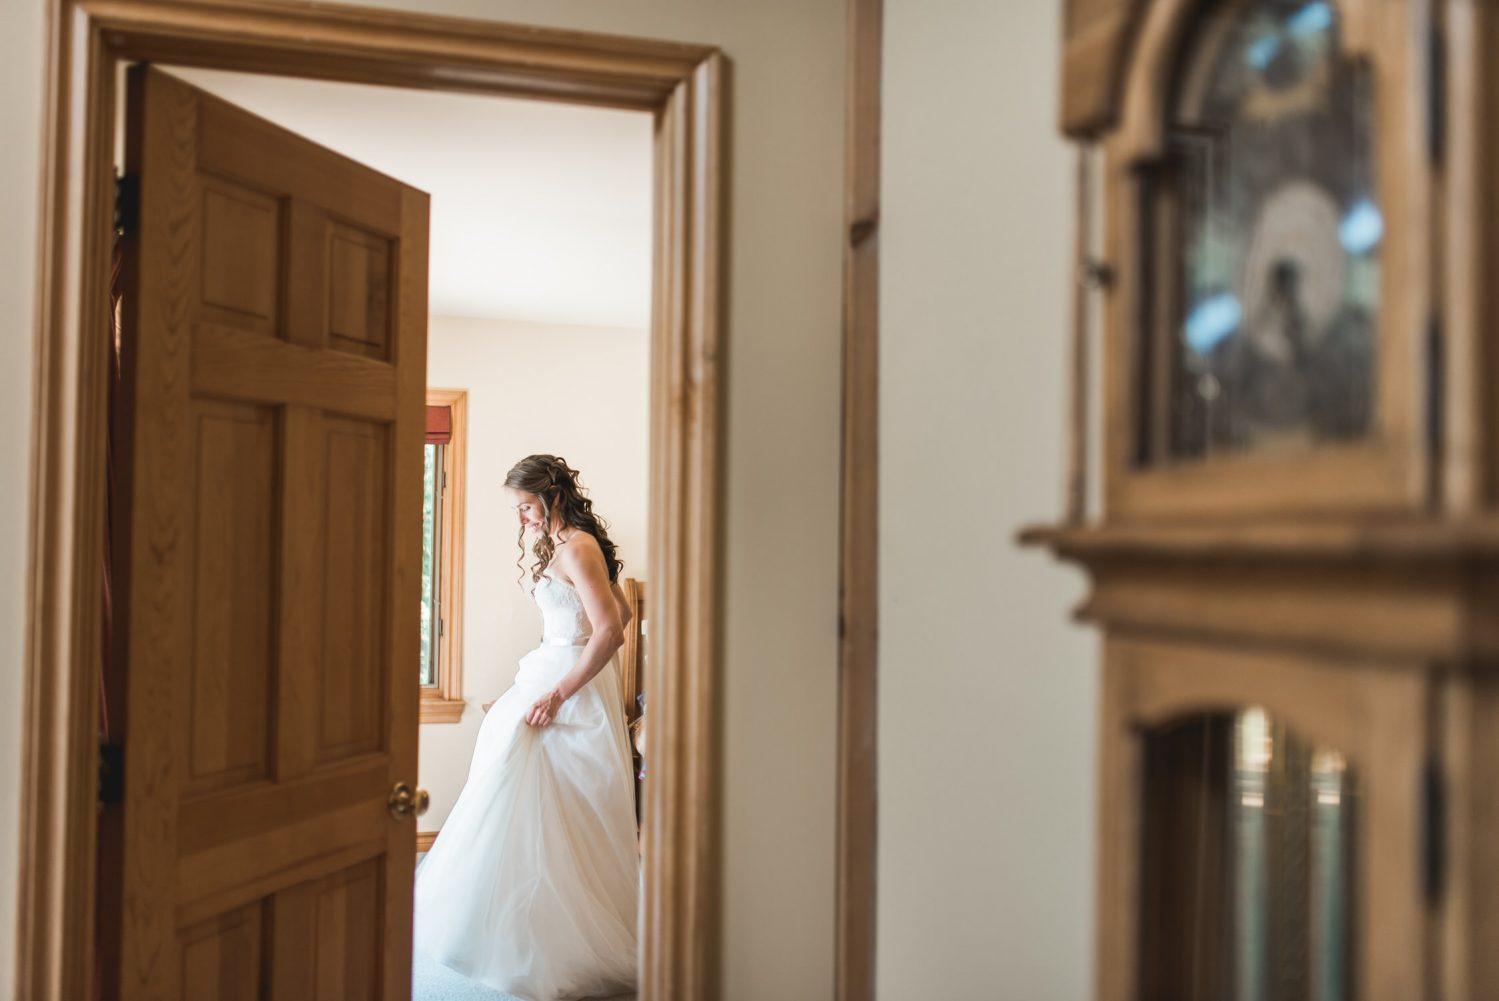 an intimate view through doorway of bride